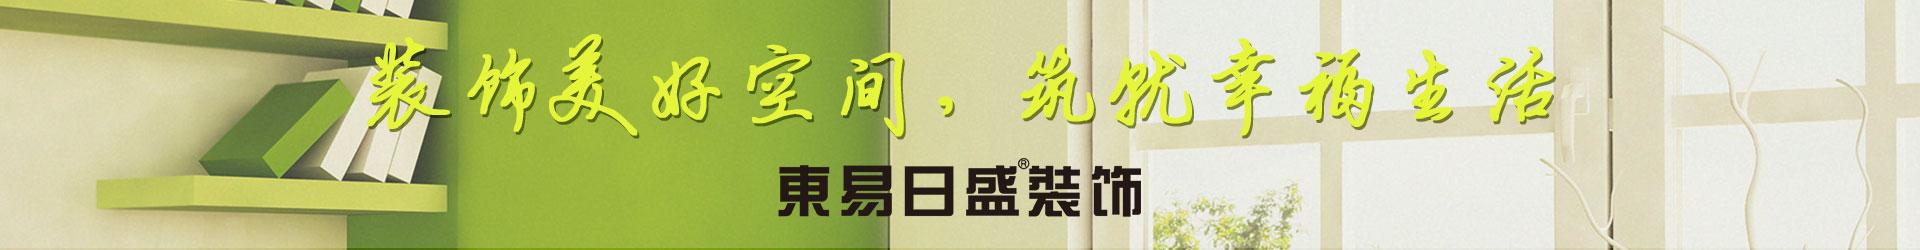 品牌实力banner